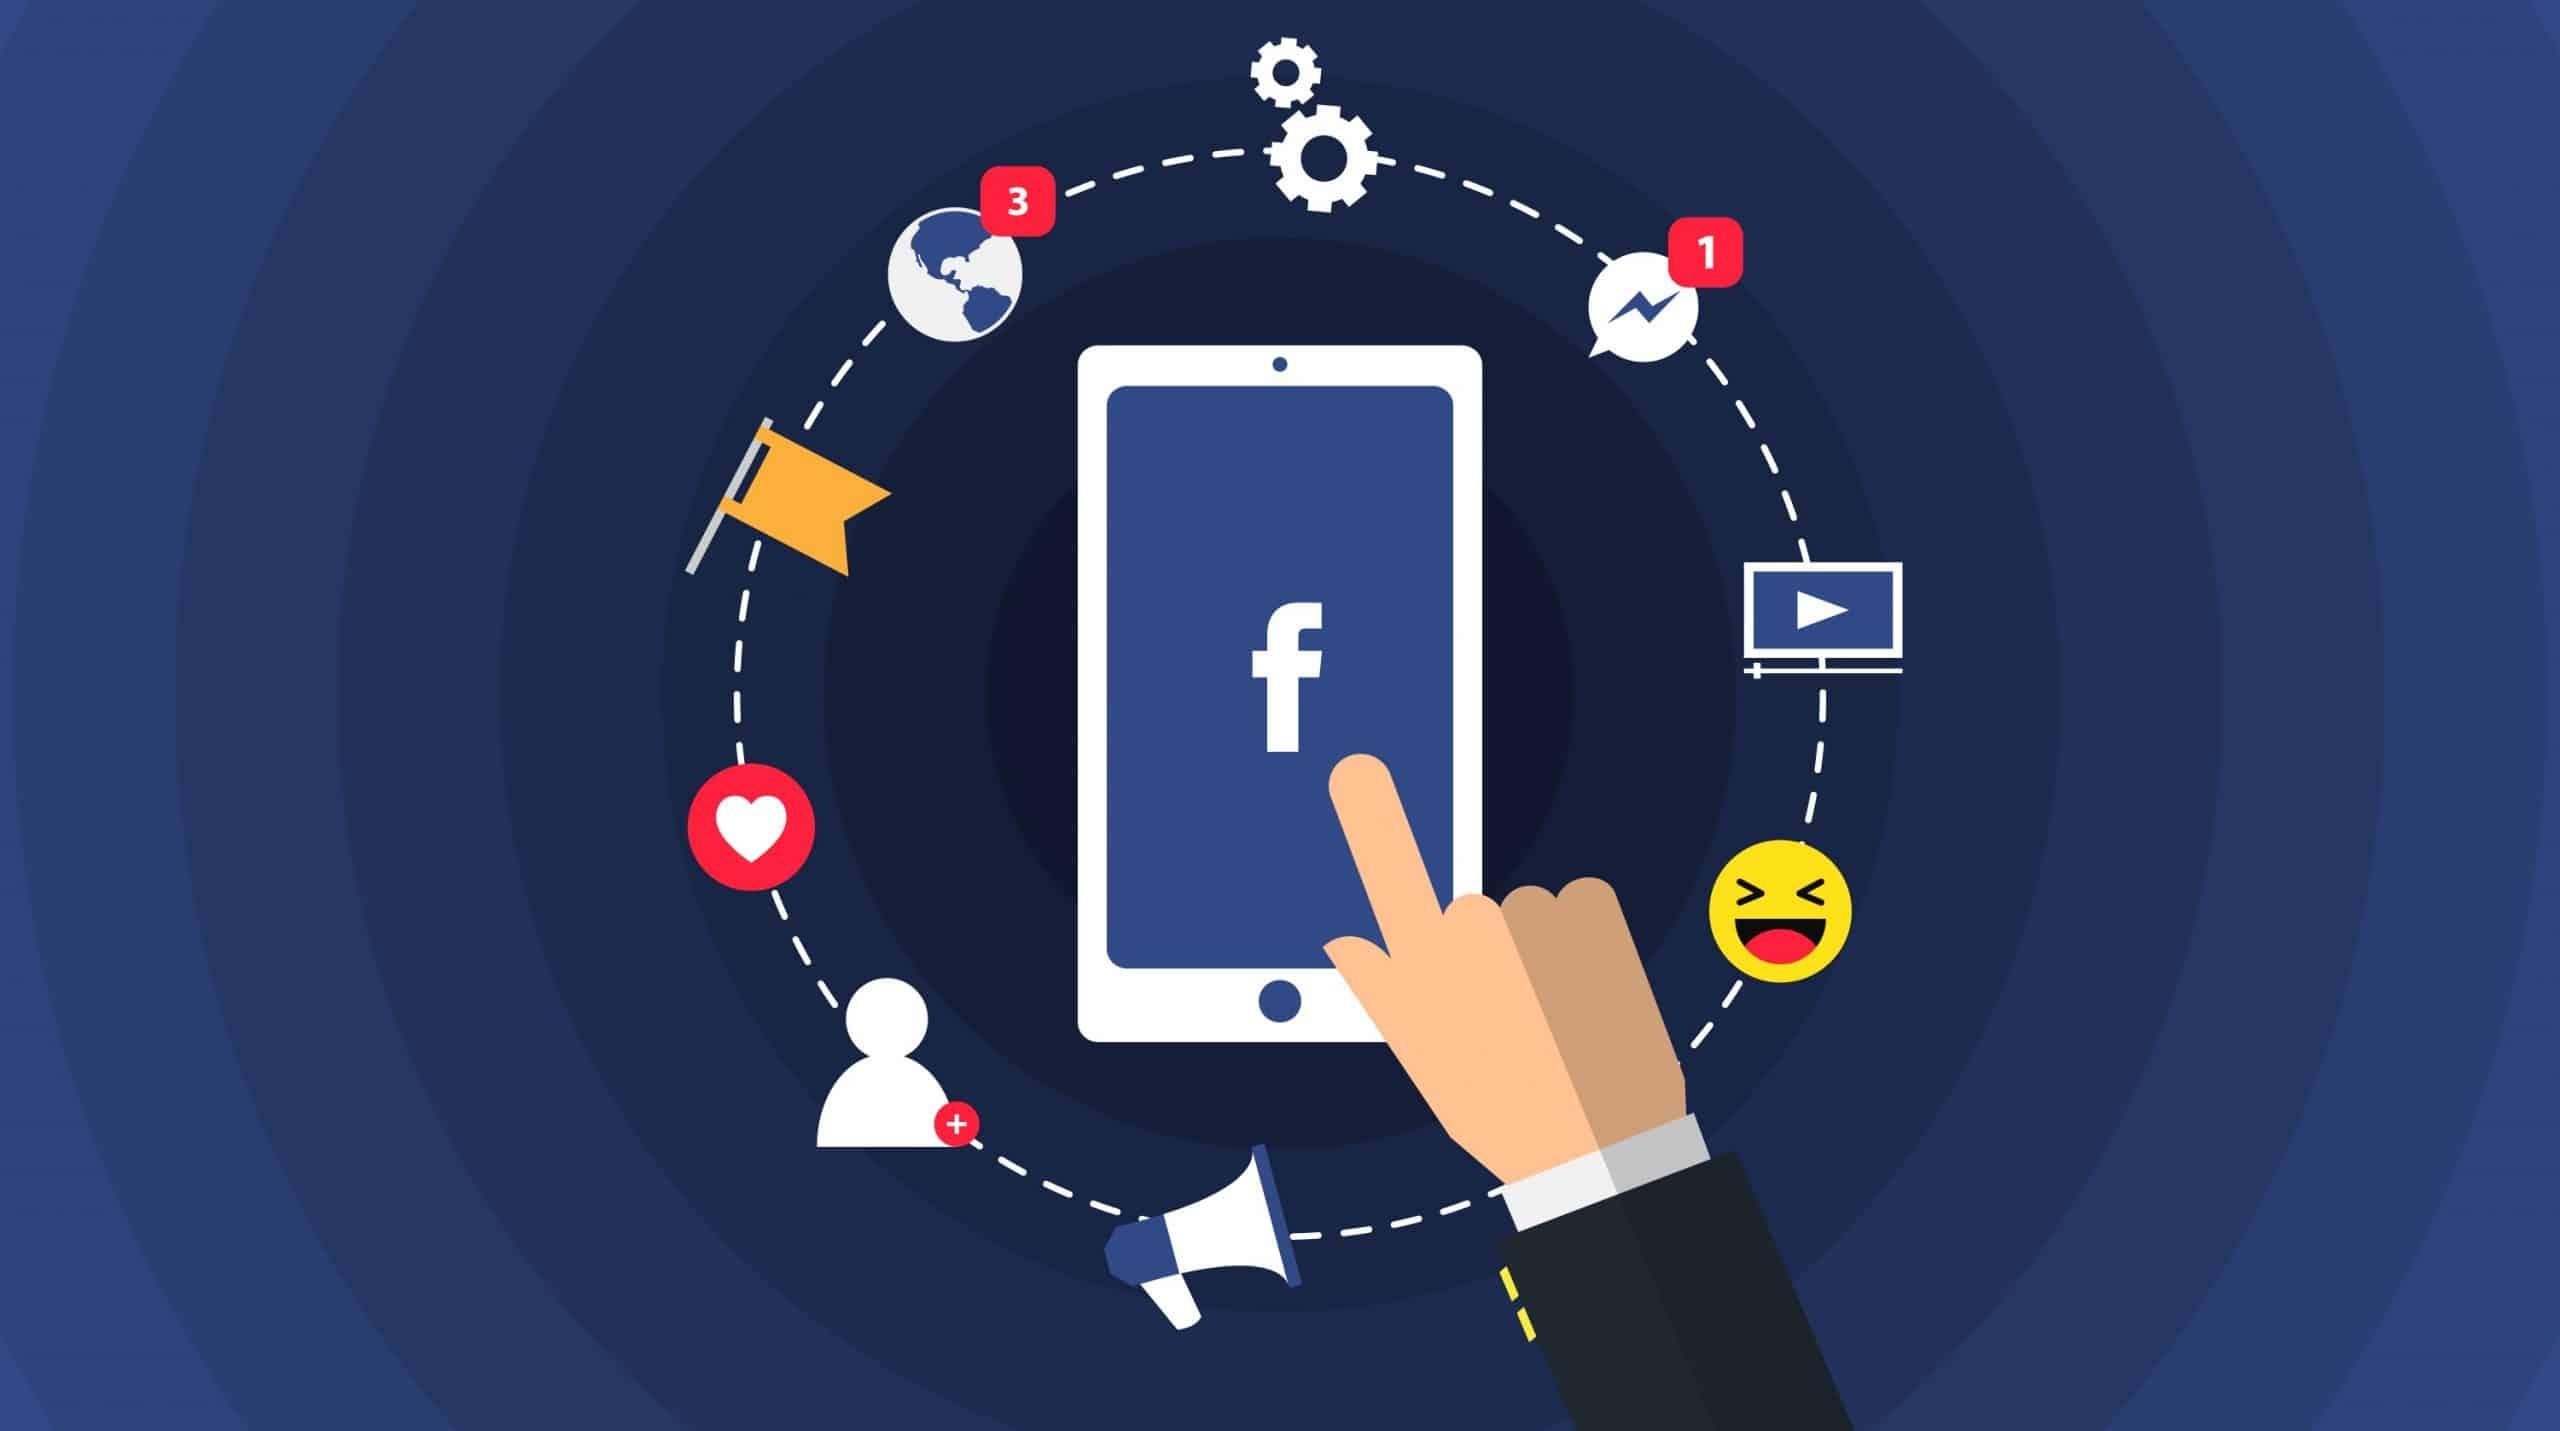 Facebook herramientas pixel BLOG LEASEIN